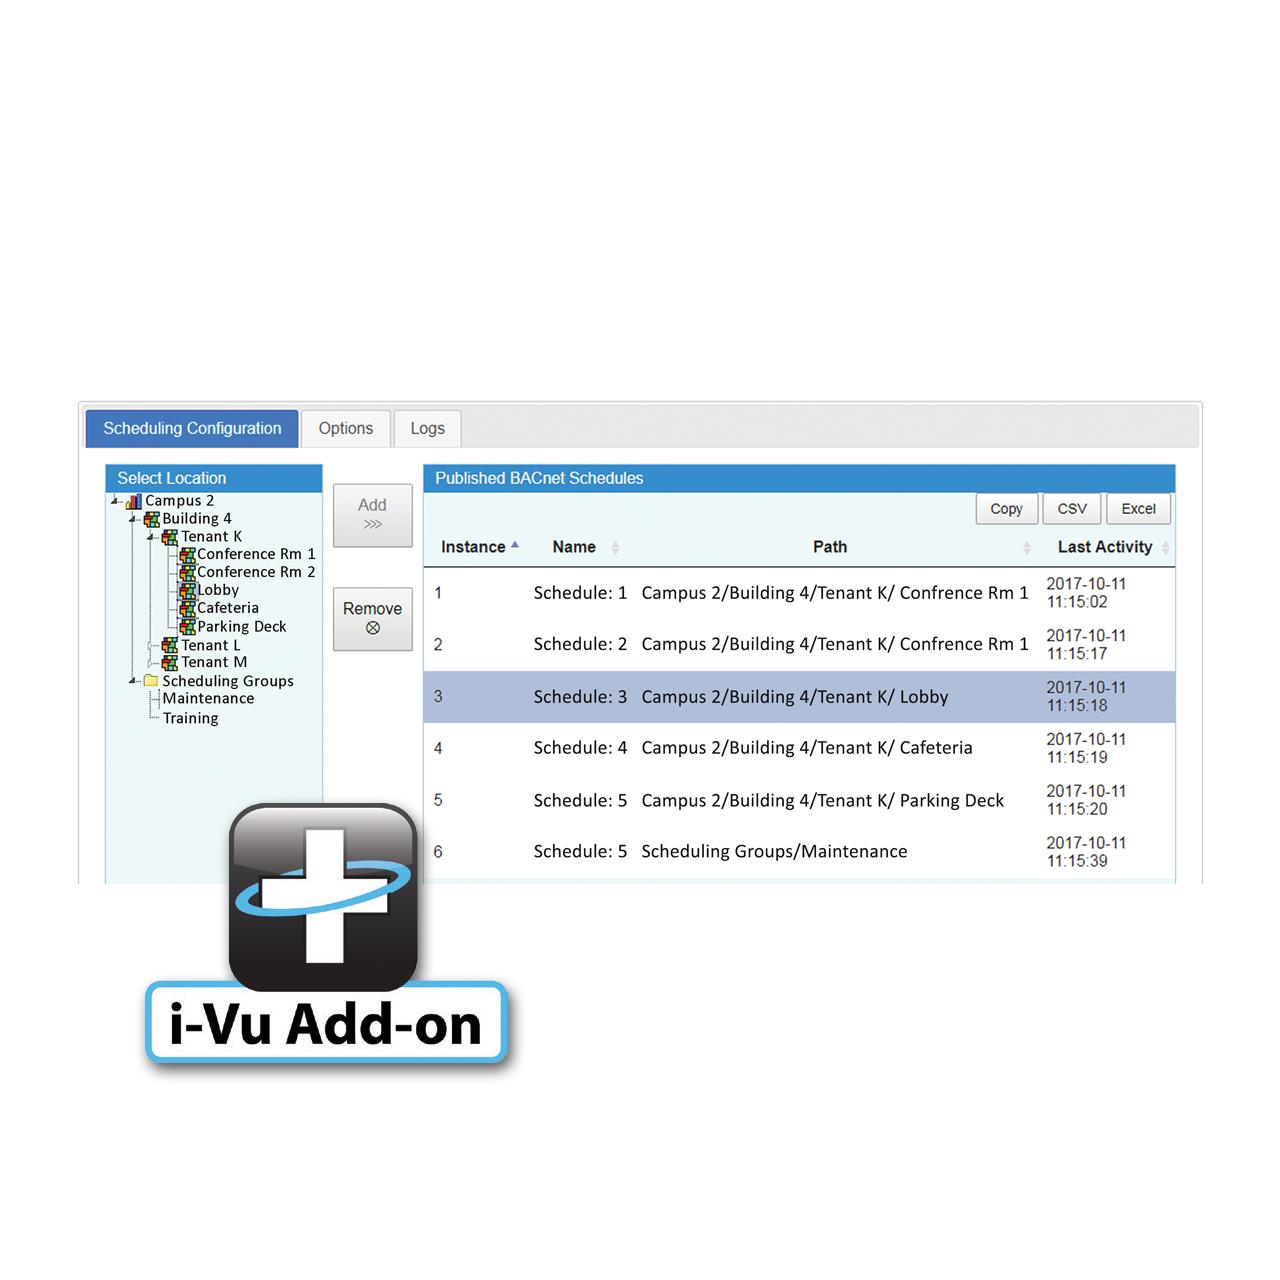 carrier-ADD-SCH-BACNET-bacnet-scheduling-interface-add-on-for-ivu